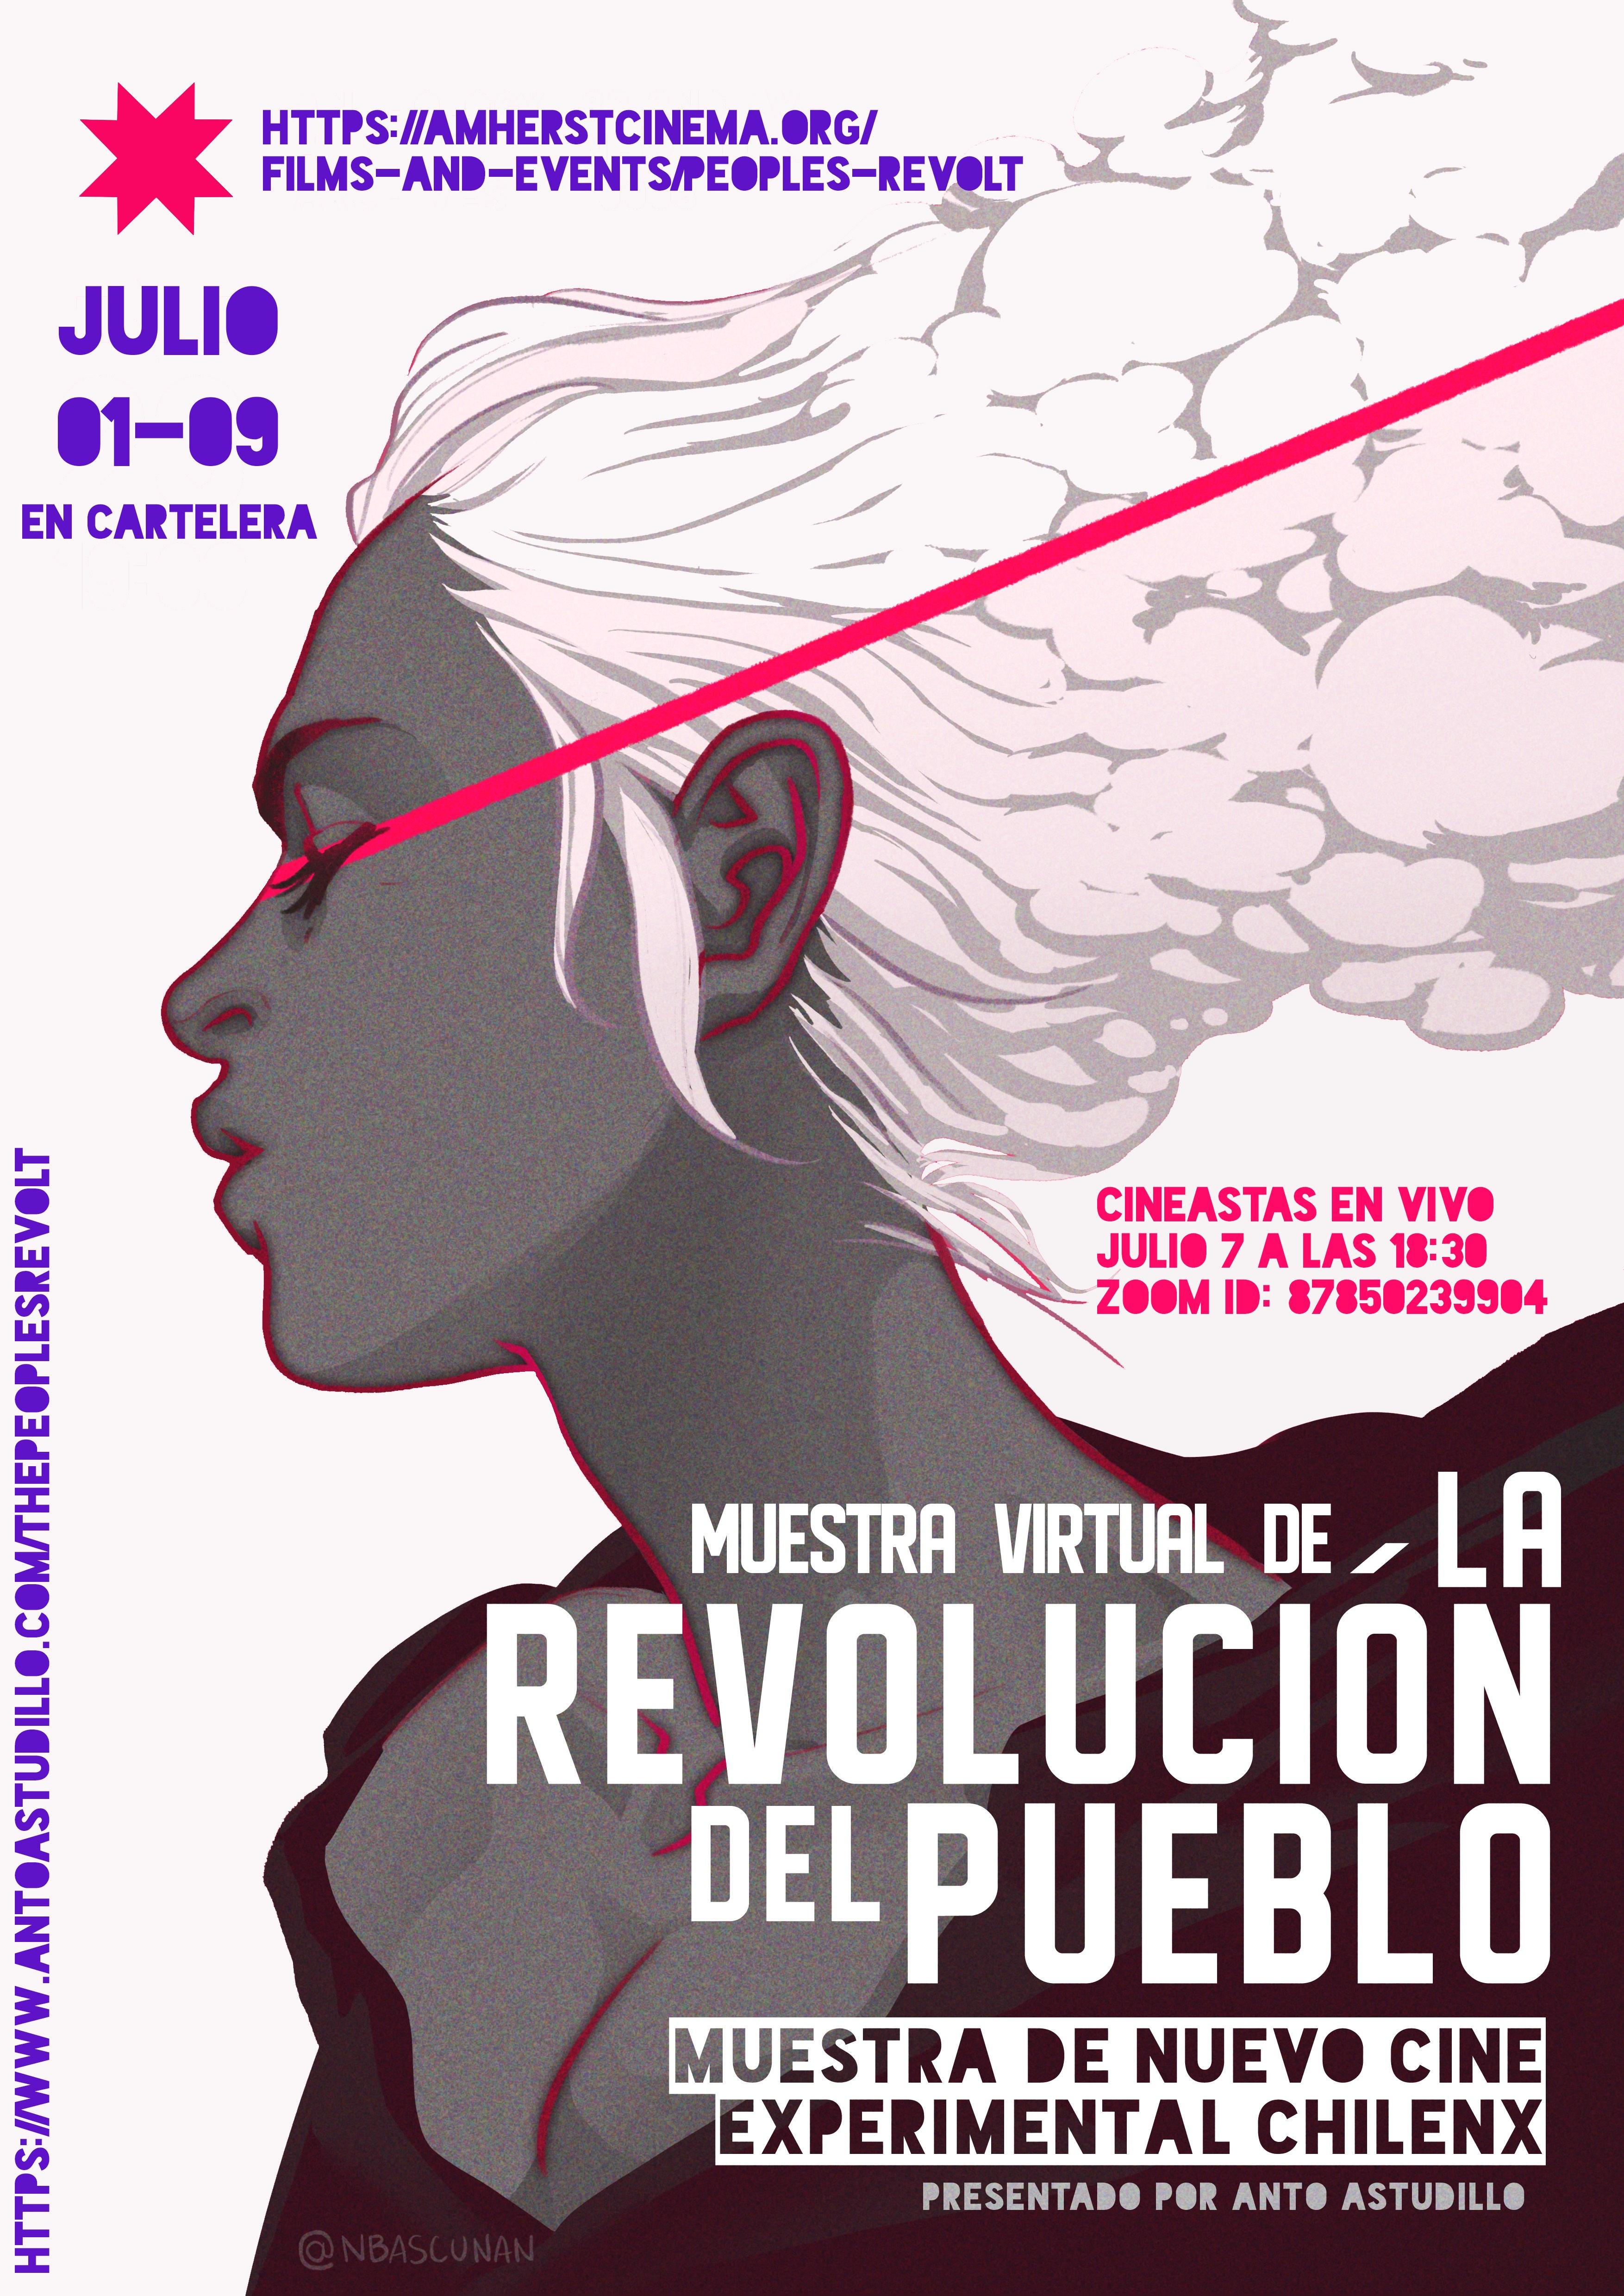 The_People's_Revolt-esp- amherst LR.jpg